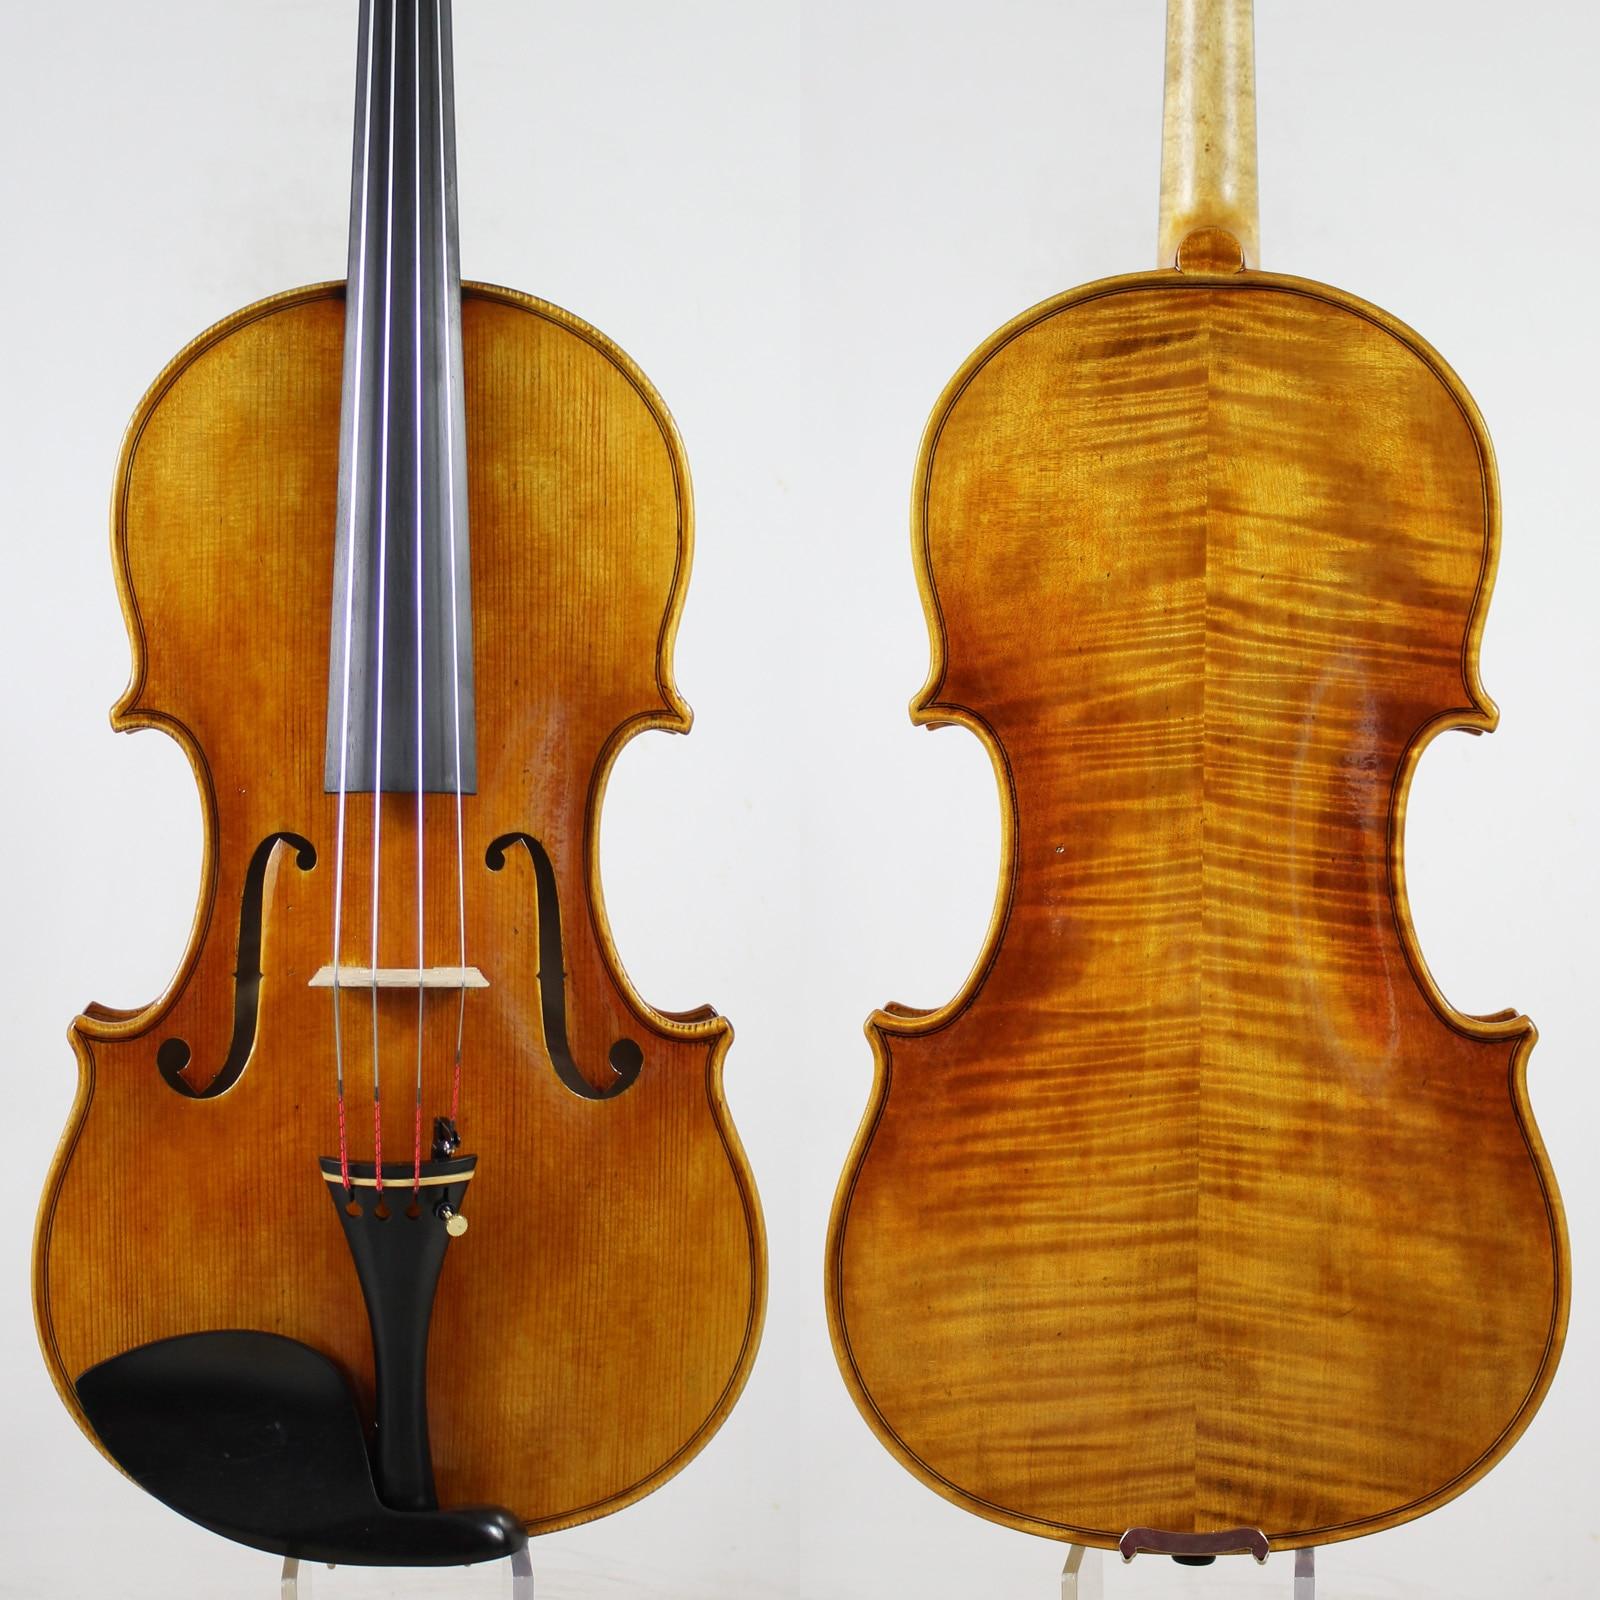 "G.B.Guadagnini 1785 Copy! 15.75"" Viola Copy, Professional Level!Antique Oil Varnish!"